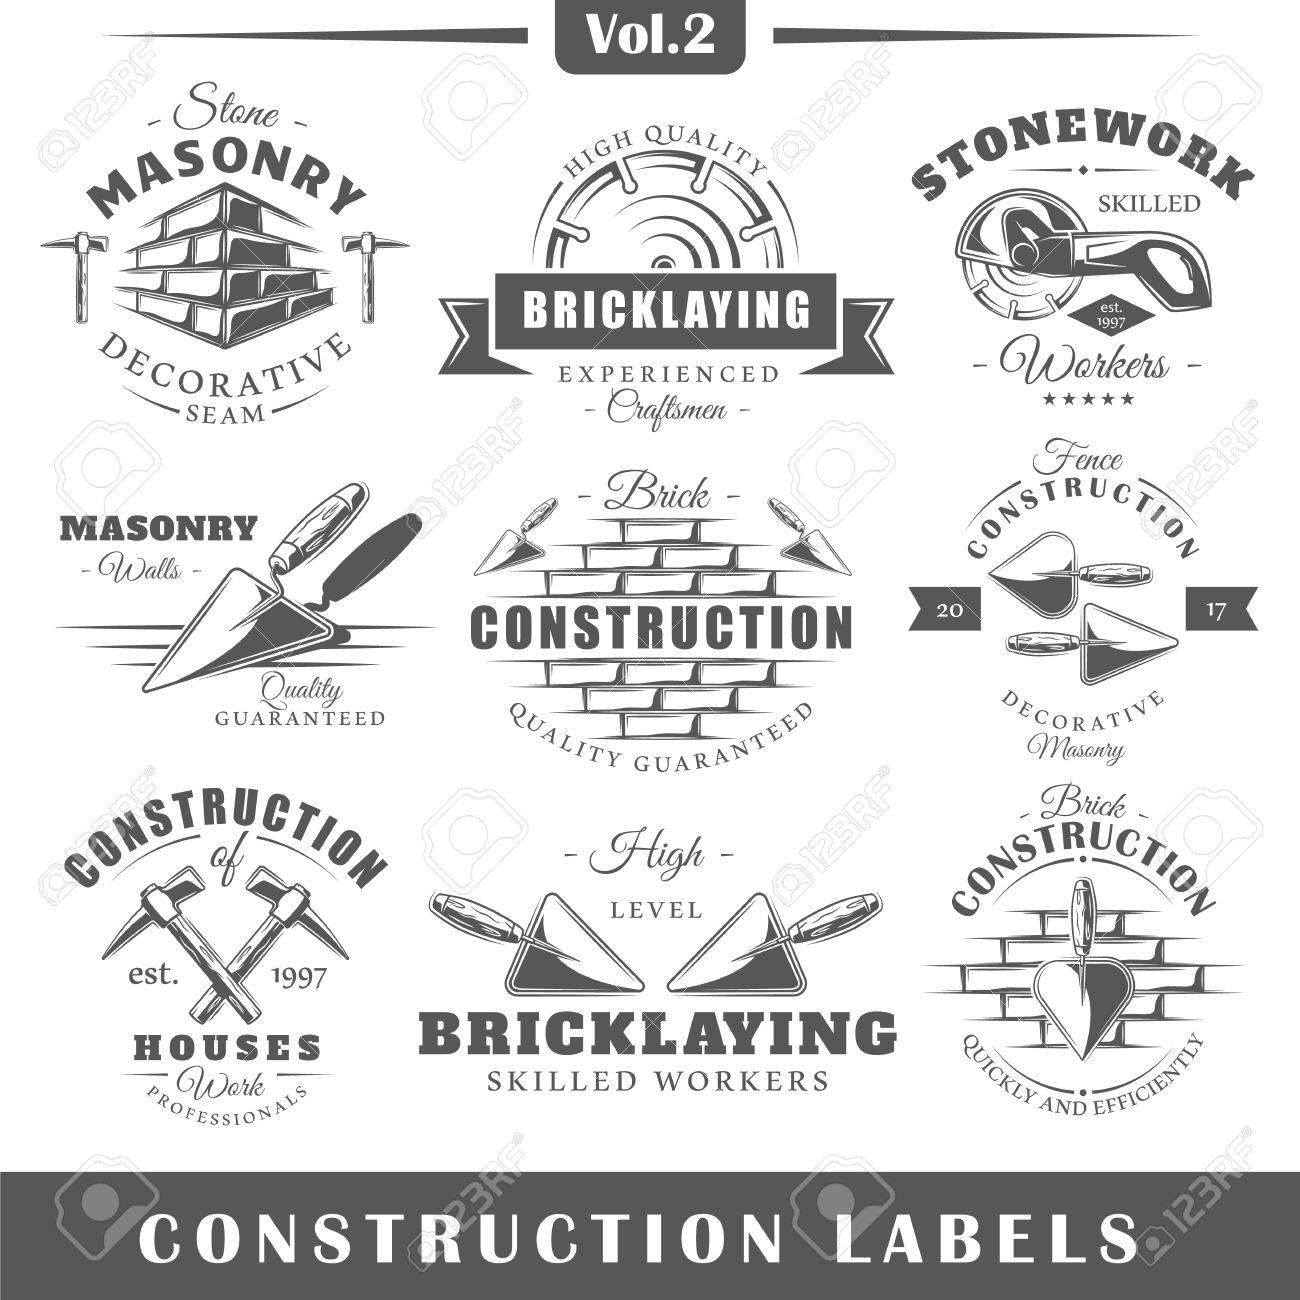 Set of vintage construction labels. Vol.2. Posters, stamps, banners and design elements. Vector illustration - 72232170